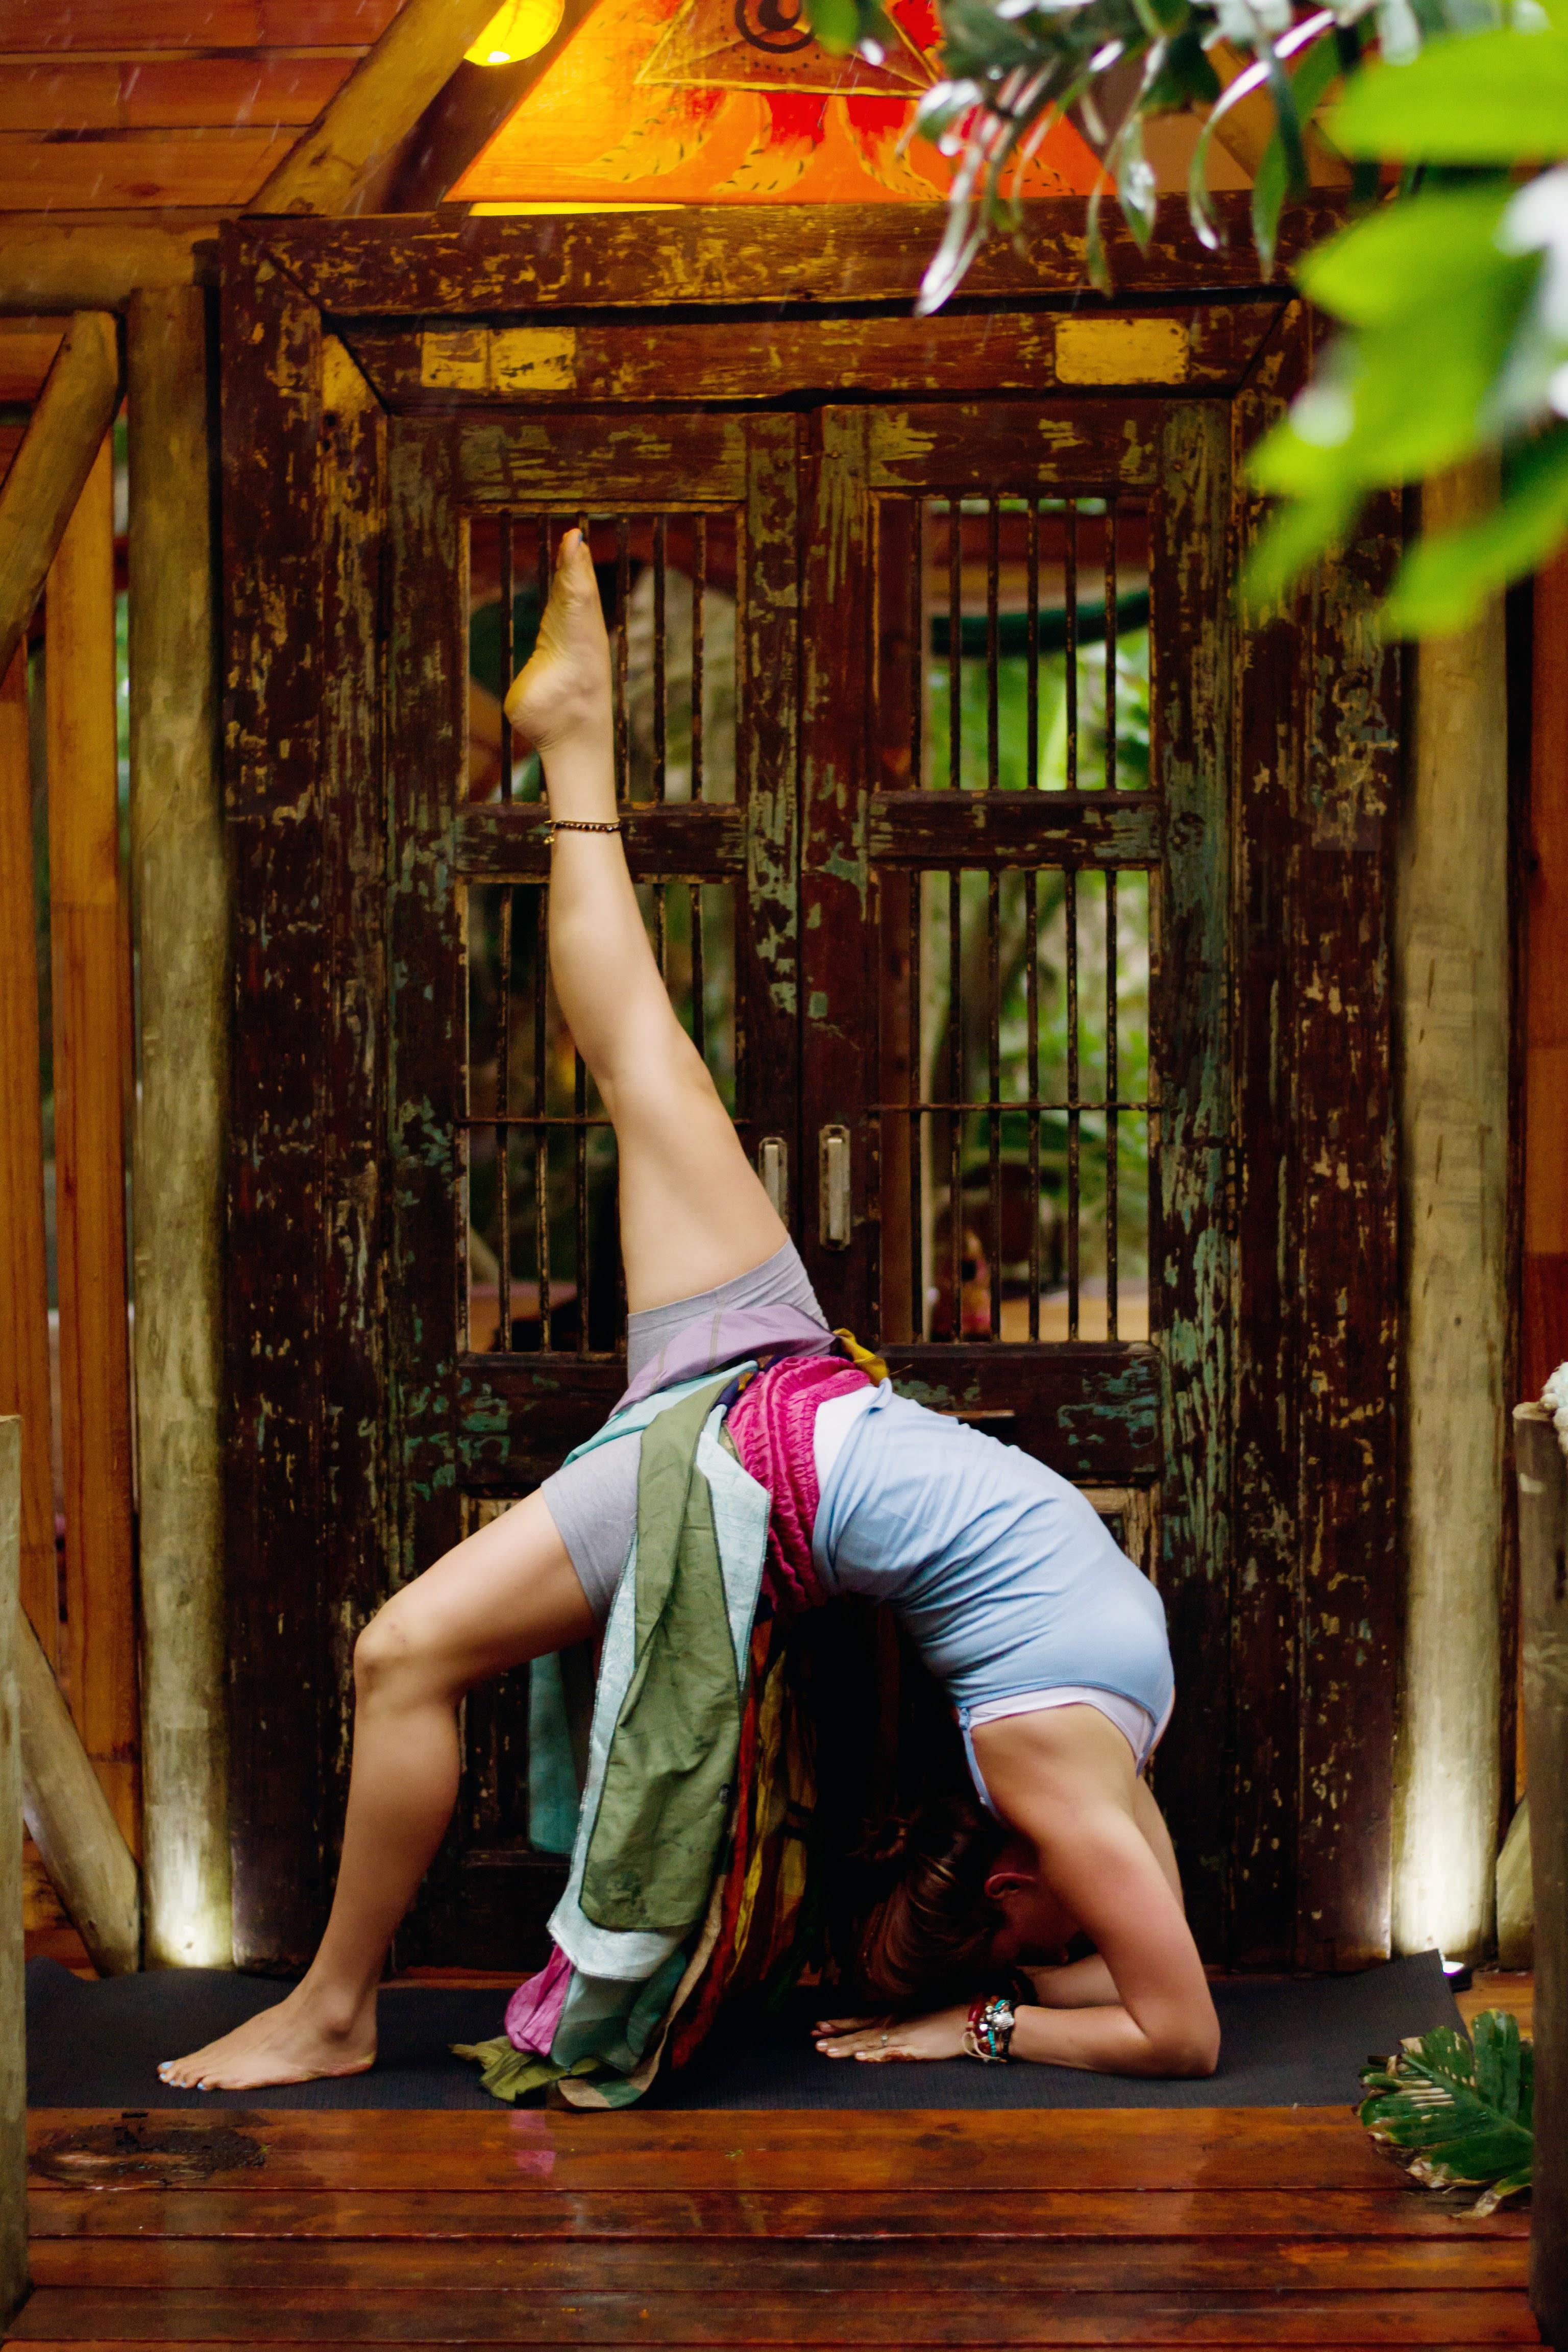 back bend yoga pose yoga teachers training yttc ttc south africa yoga trainer